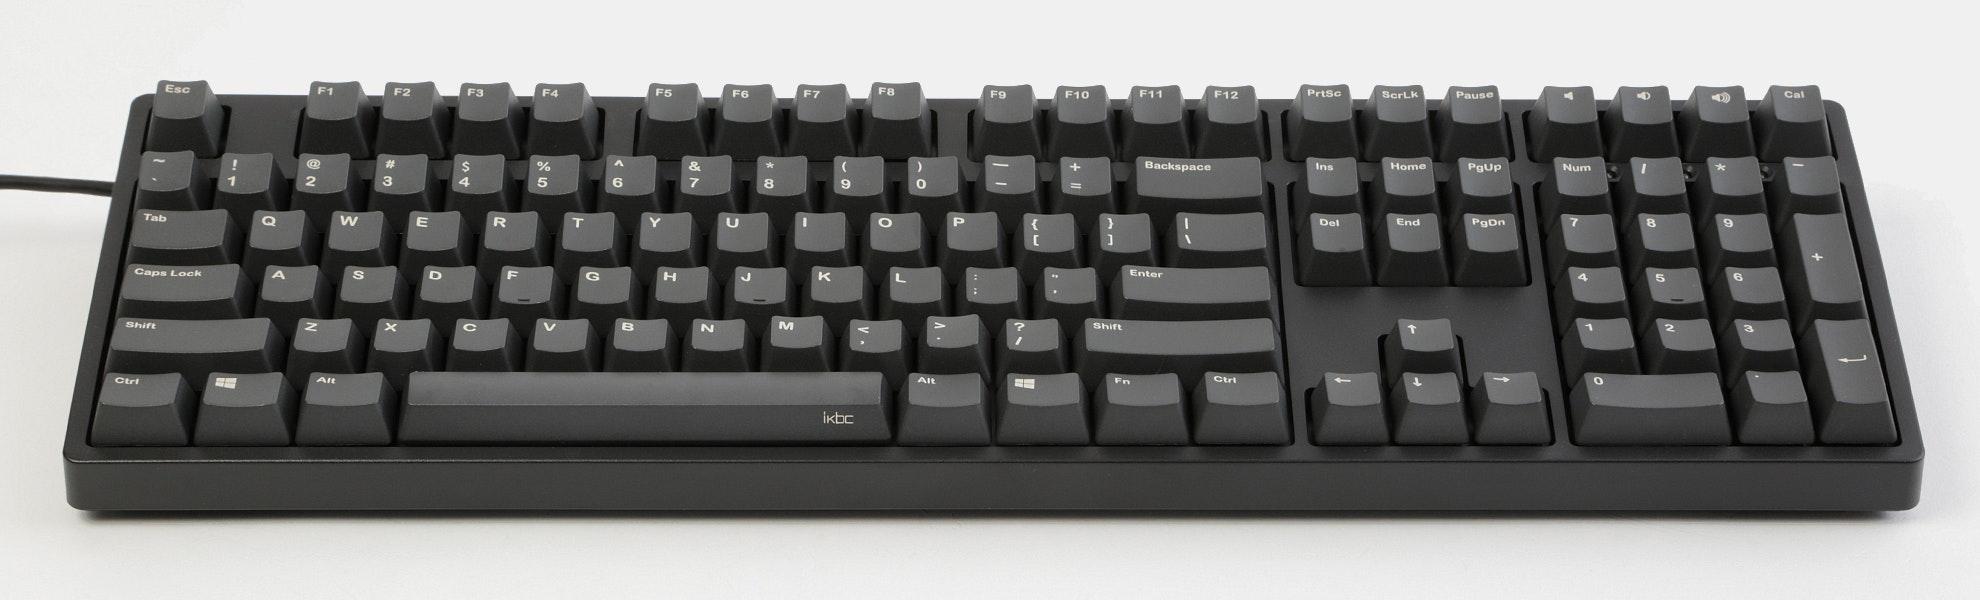 IKBC CD108 Full-Size Mechanical Keyboard